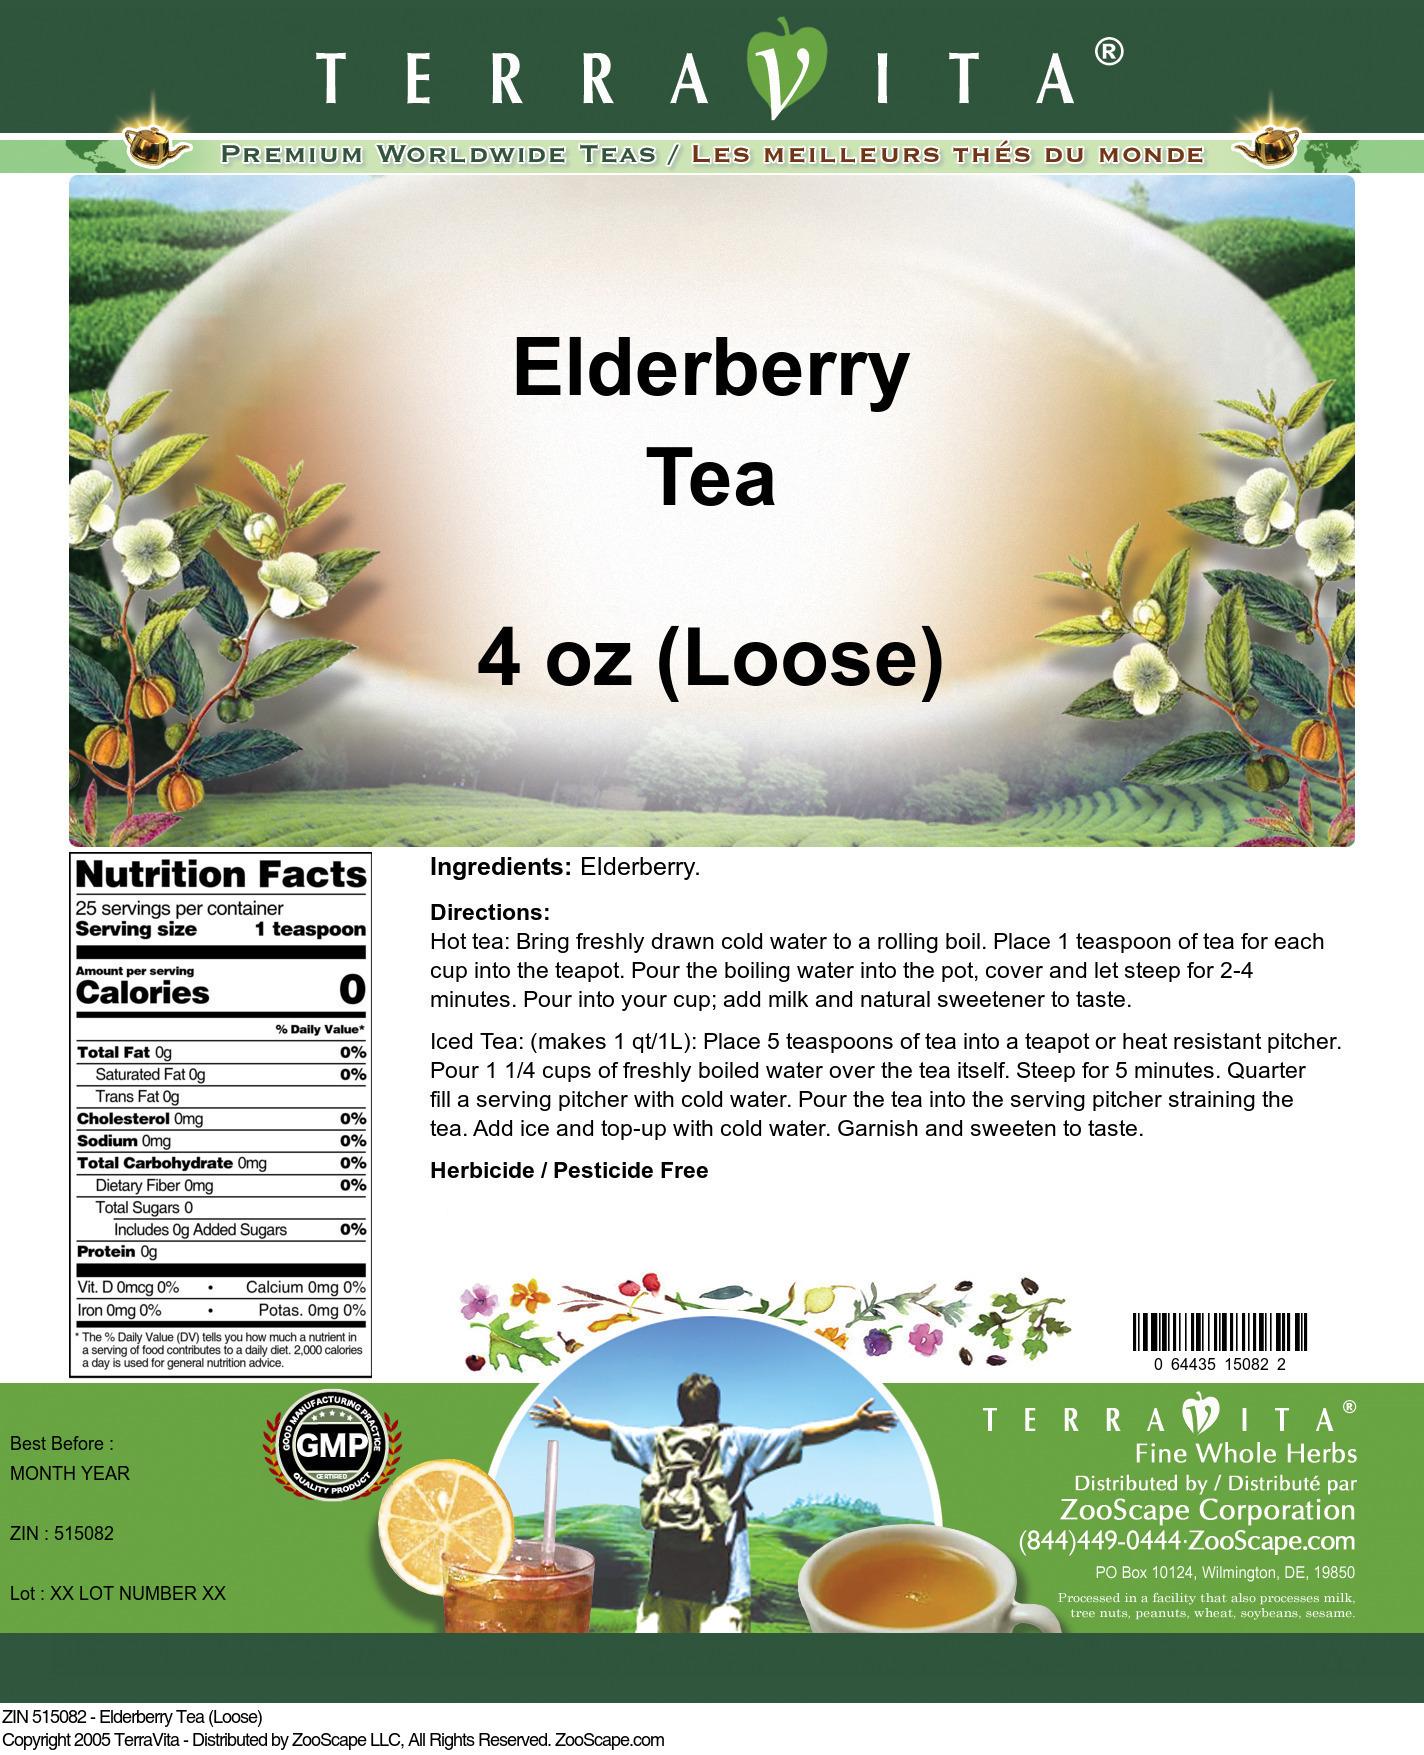 Elderberry Tea (Loose)